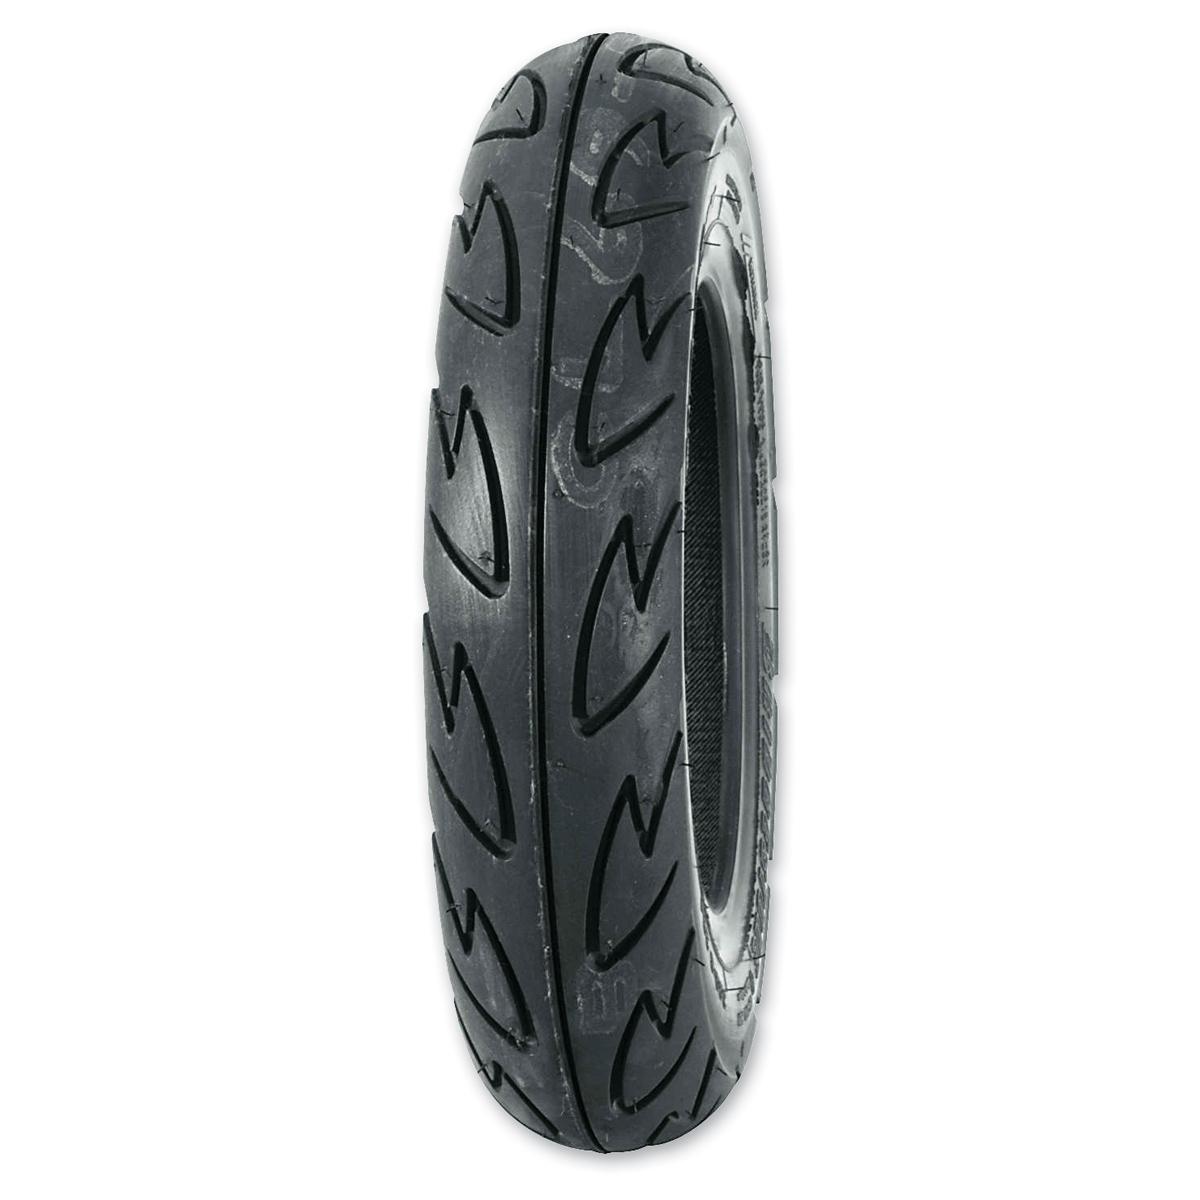 Bridgestone B01 HOOP 3.00-8 Front/Rear Tire